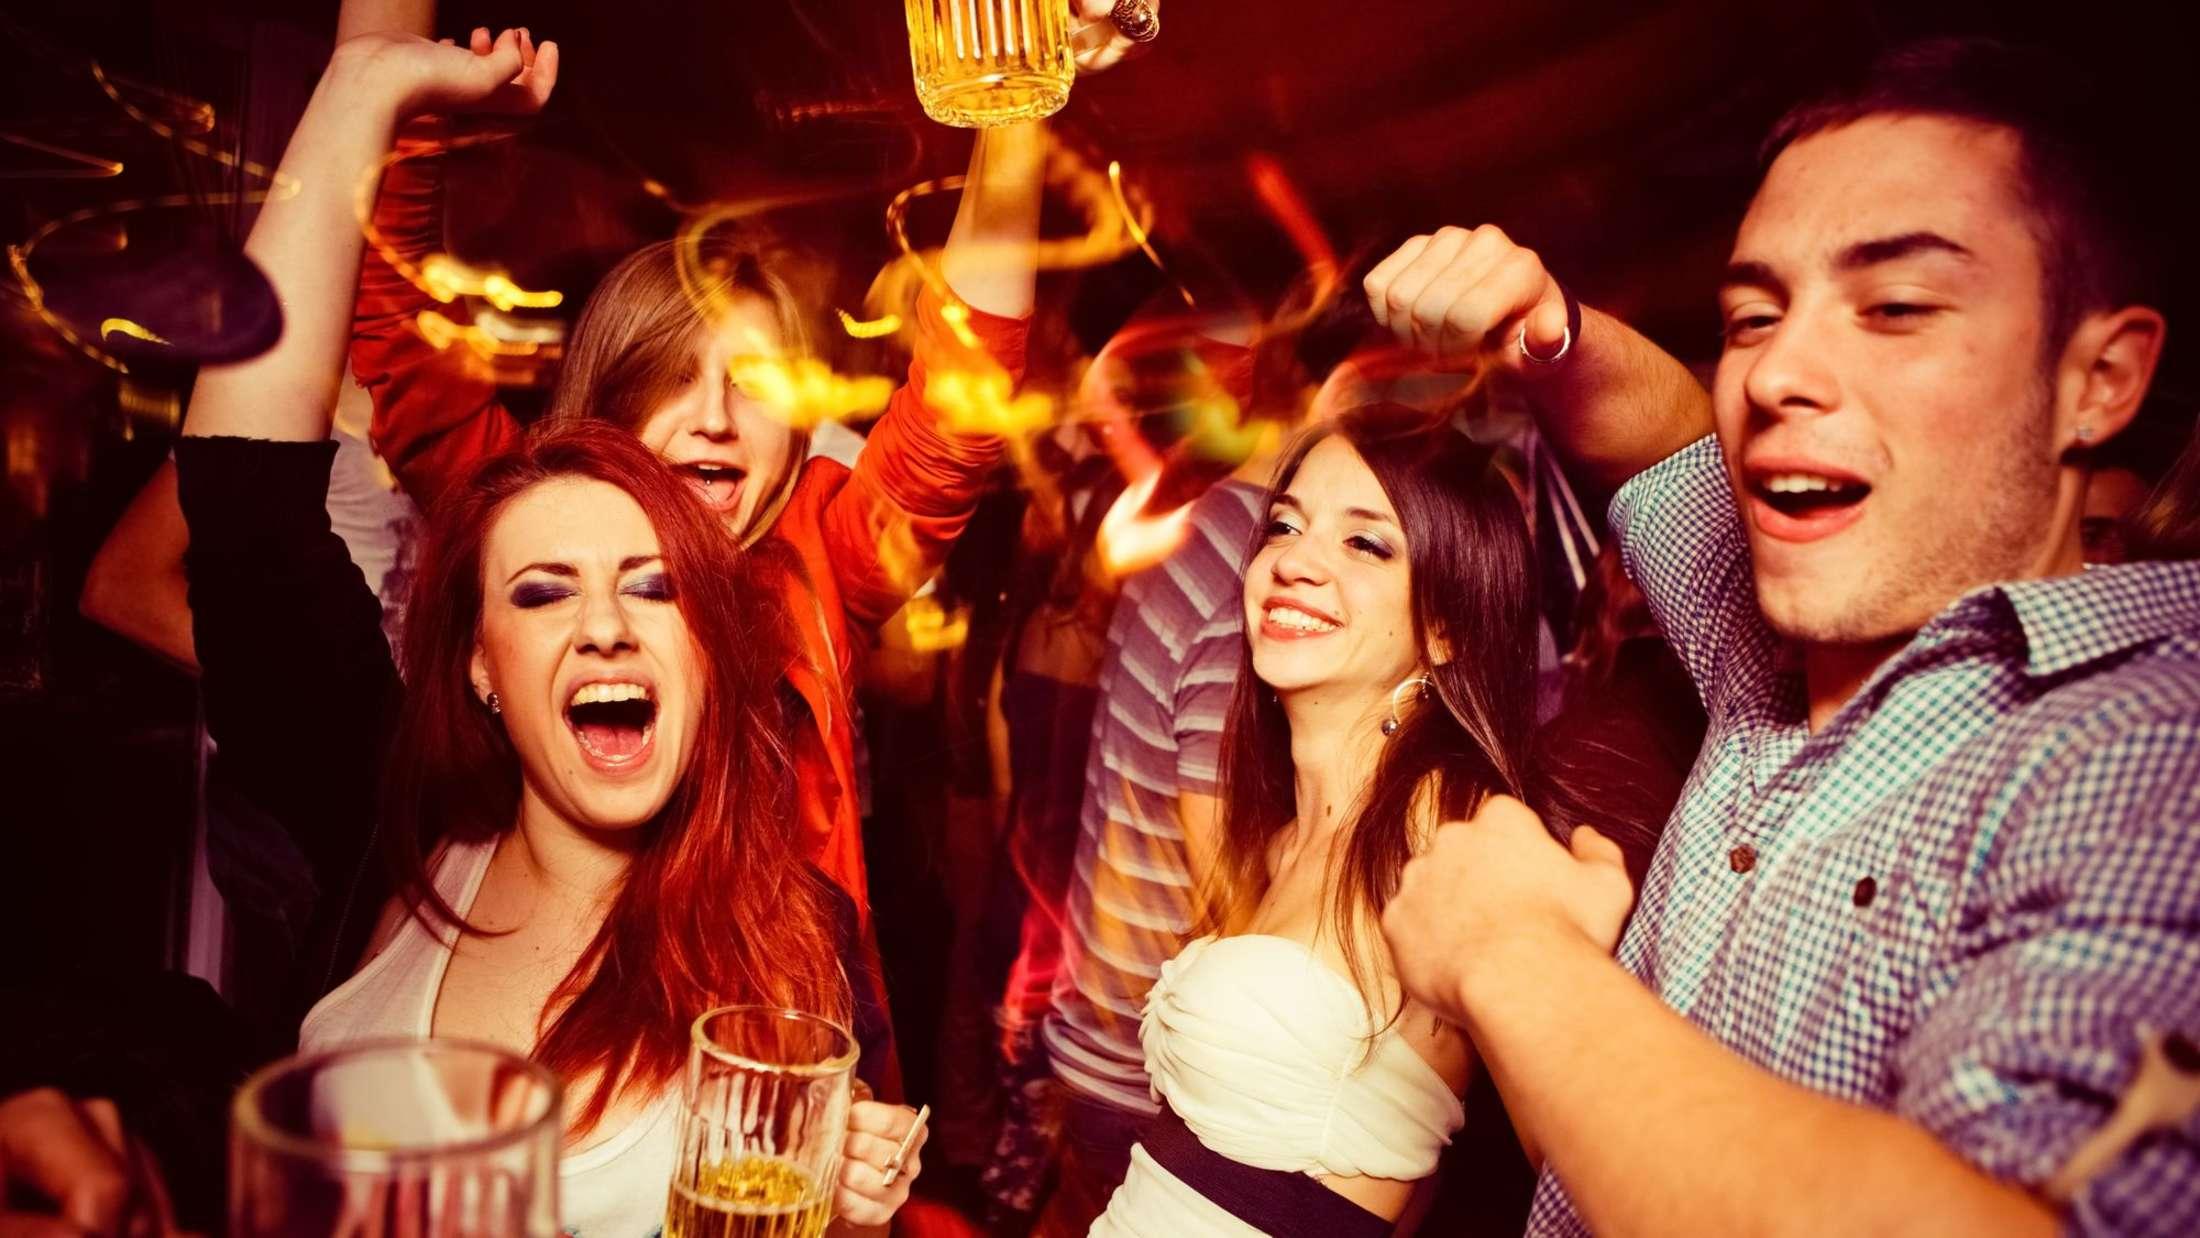 Fulda single party